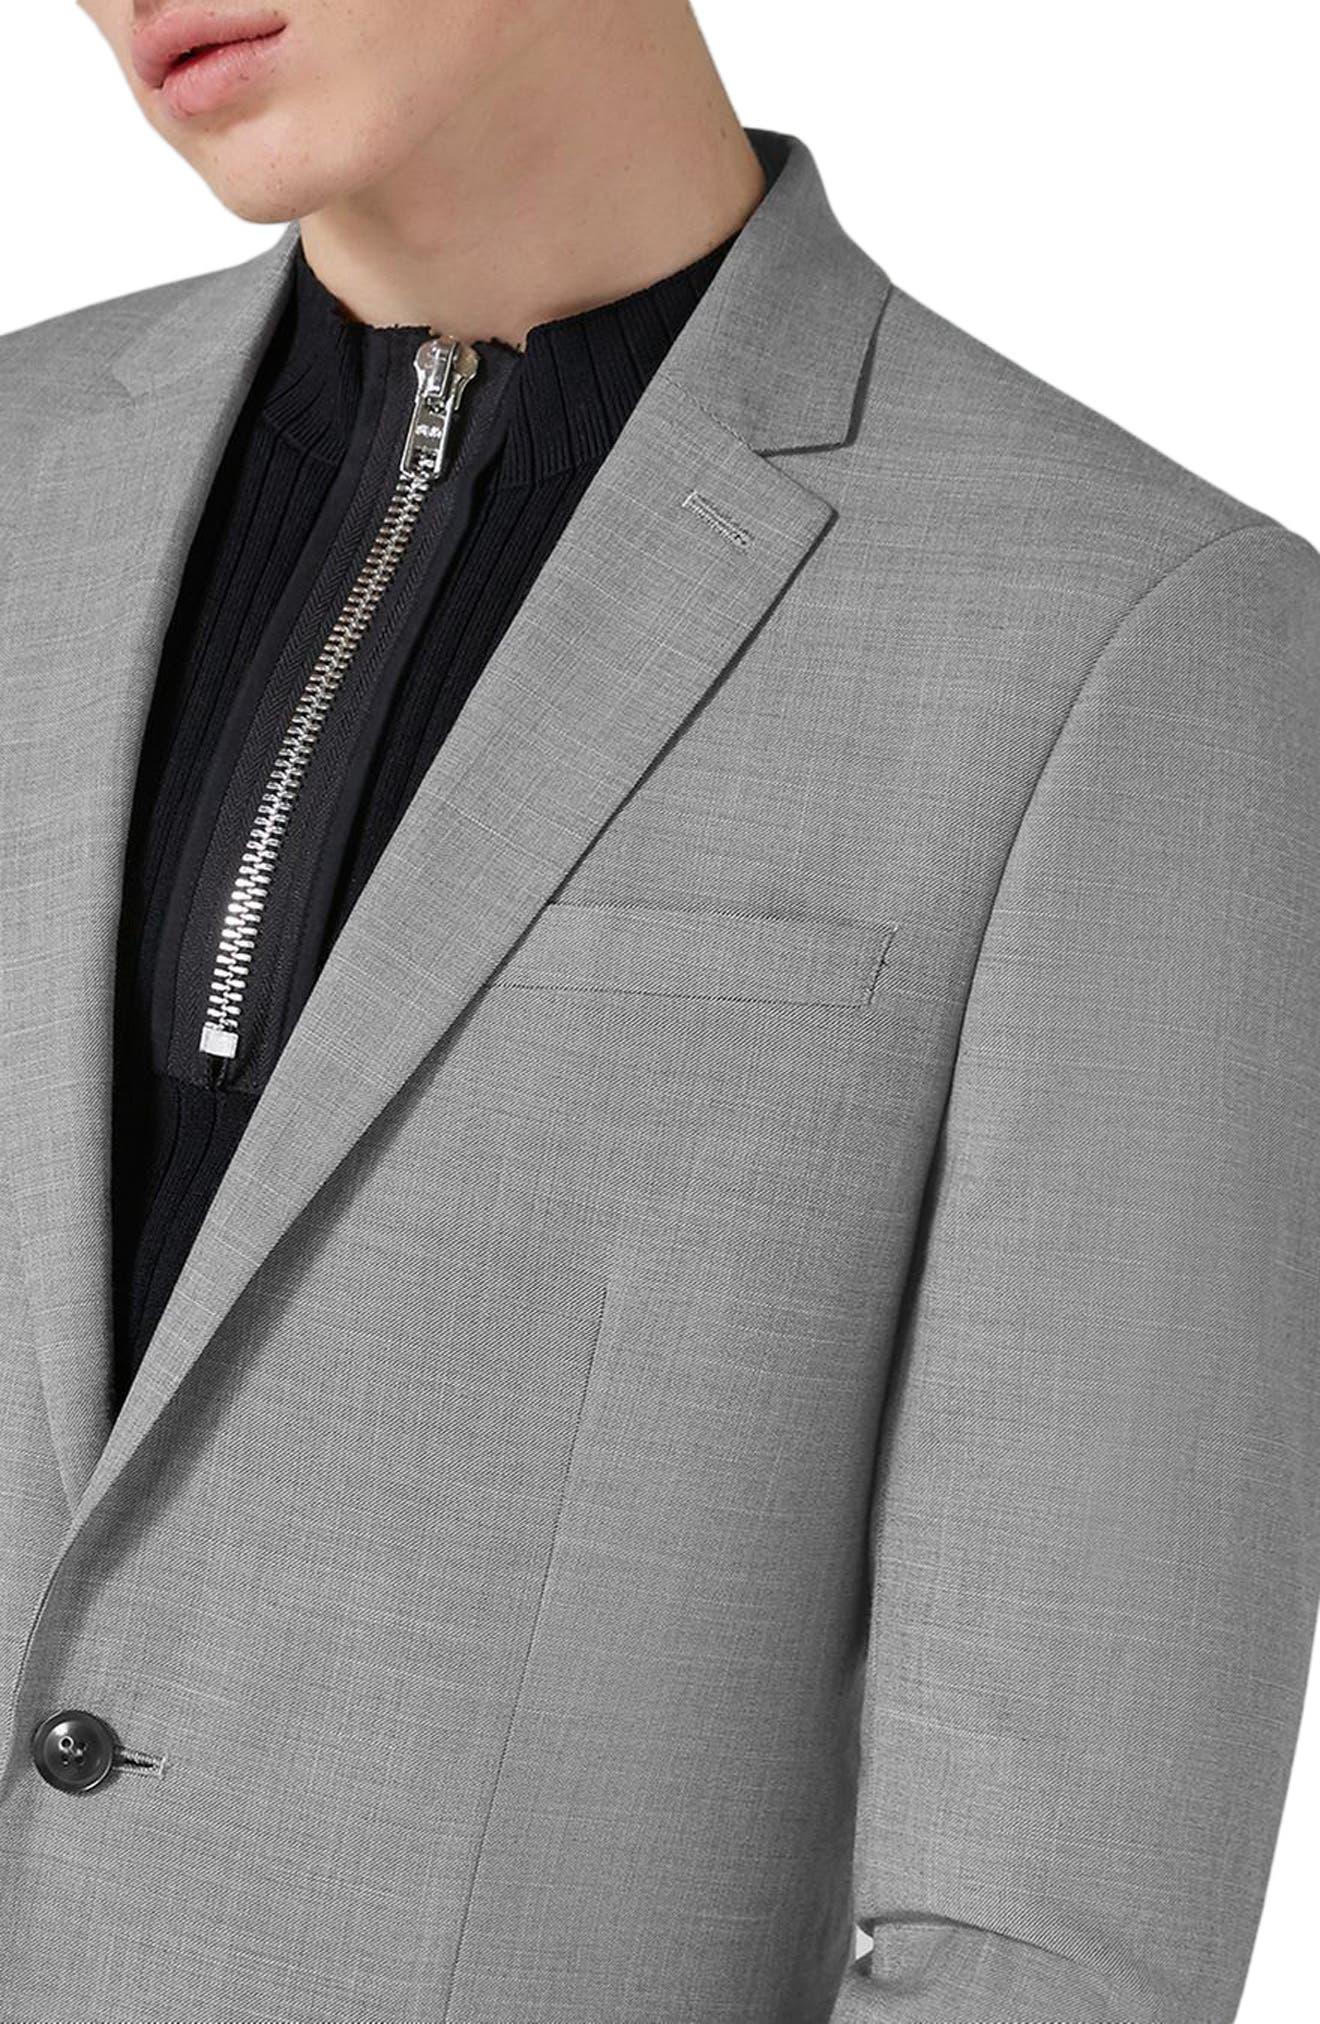 TOPMAN, Skinny Fit Suit Jacket, Alternate thumbnail 4, color, GREY